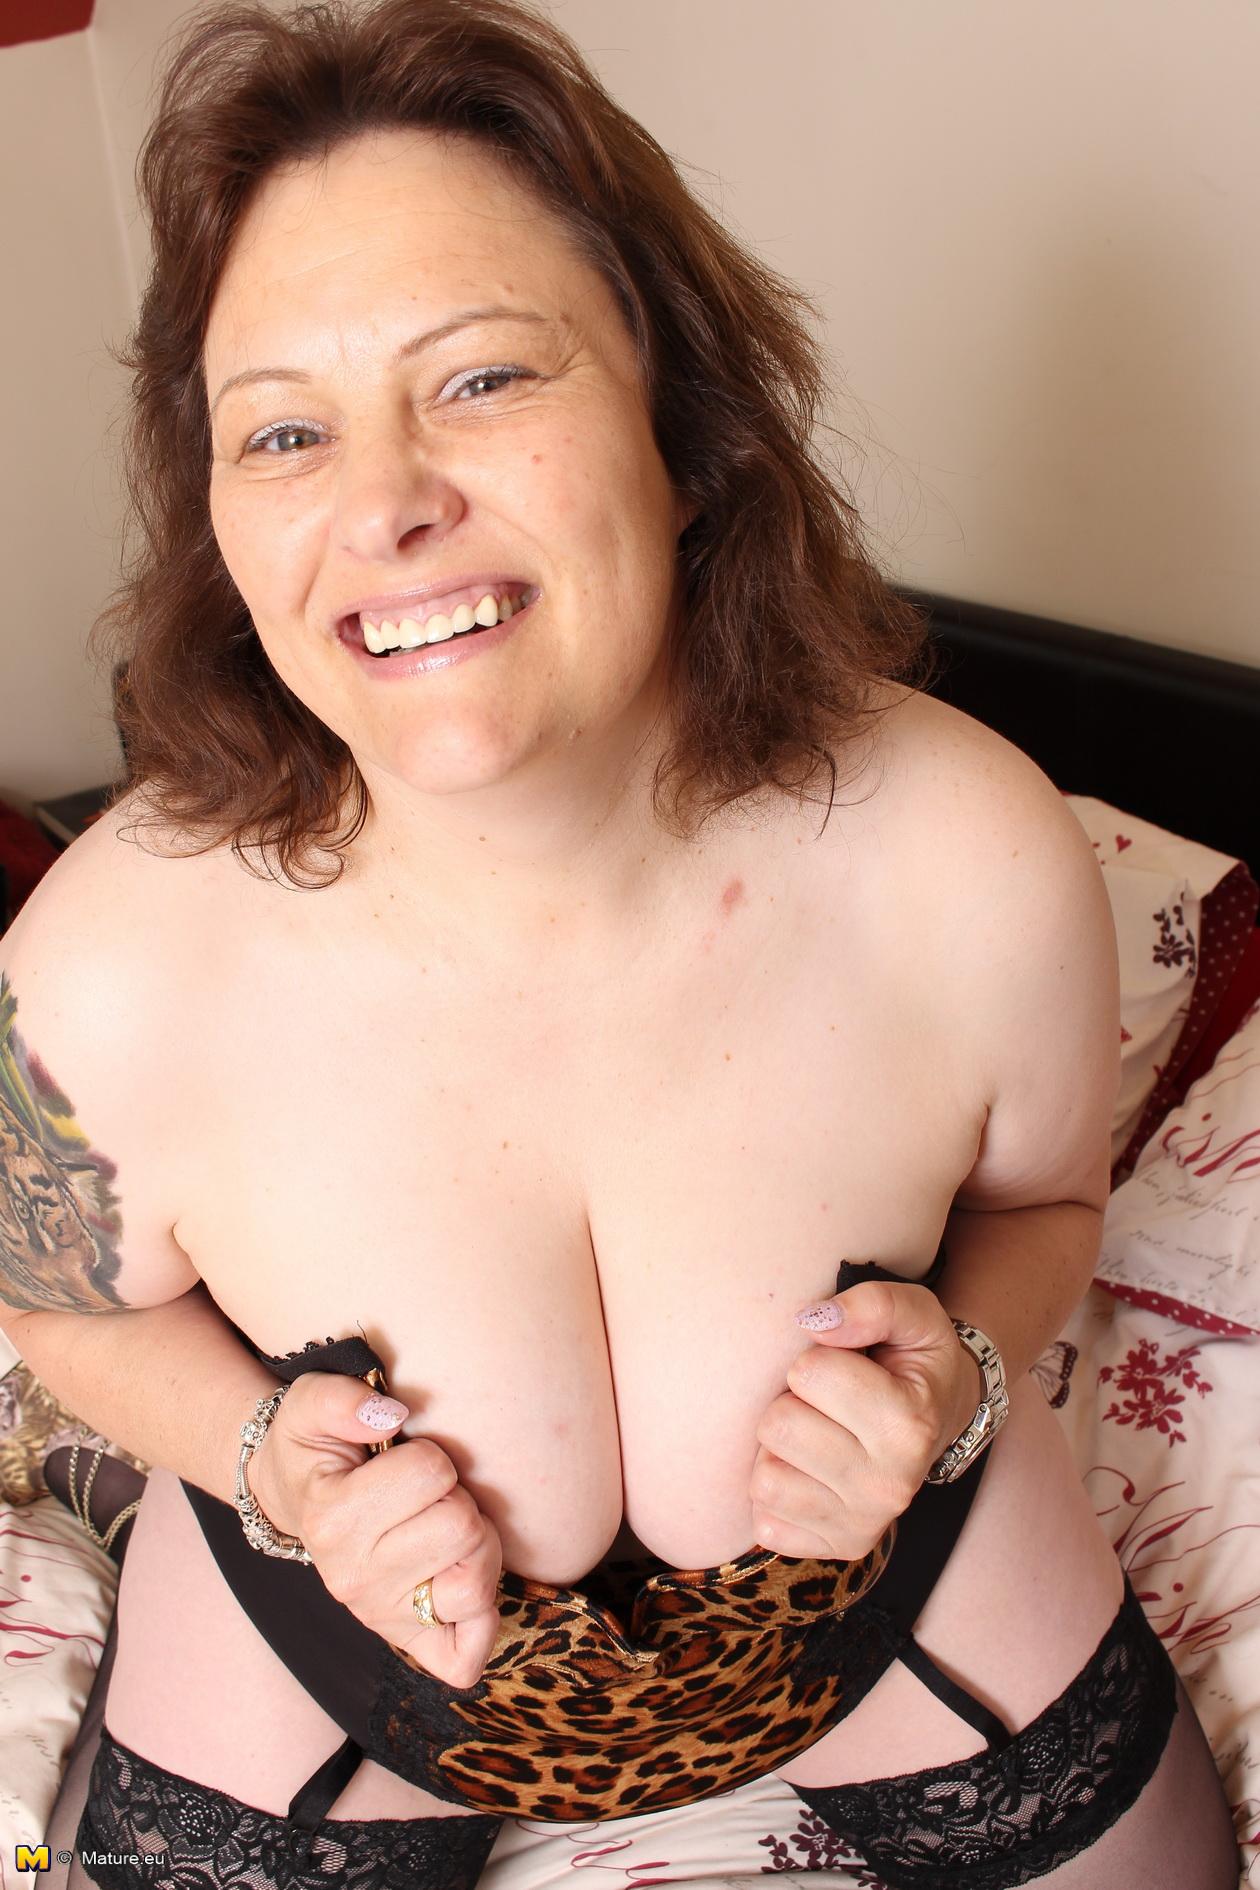 Chubby Big Tits Lesbian